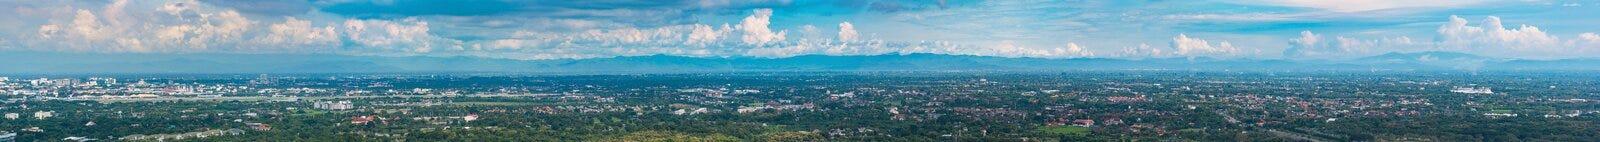 Image de panorama de province de Chiang Mai, Thaïlande Image stock